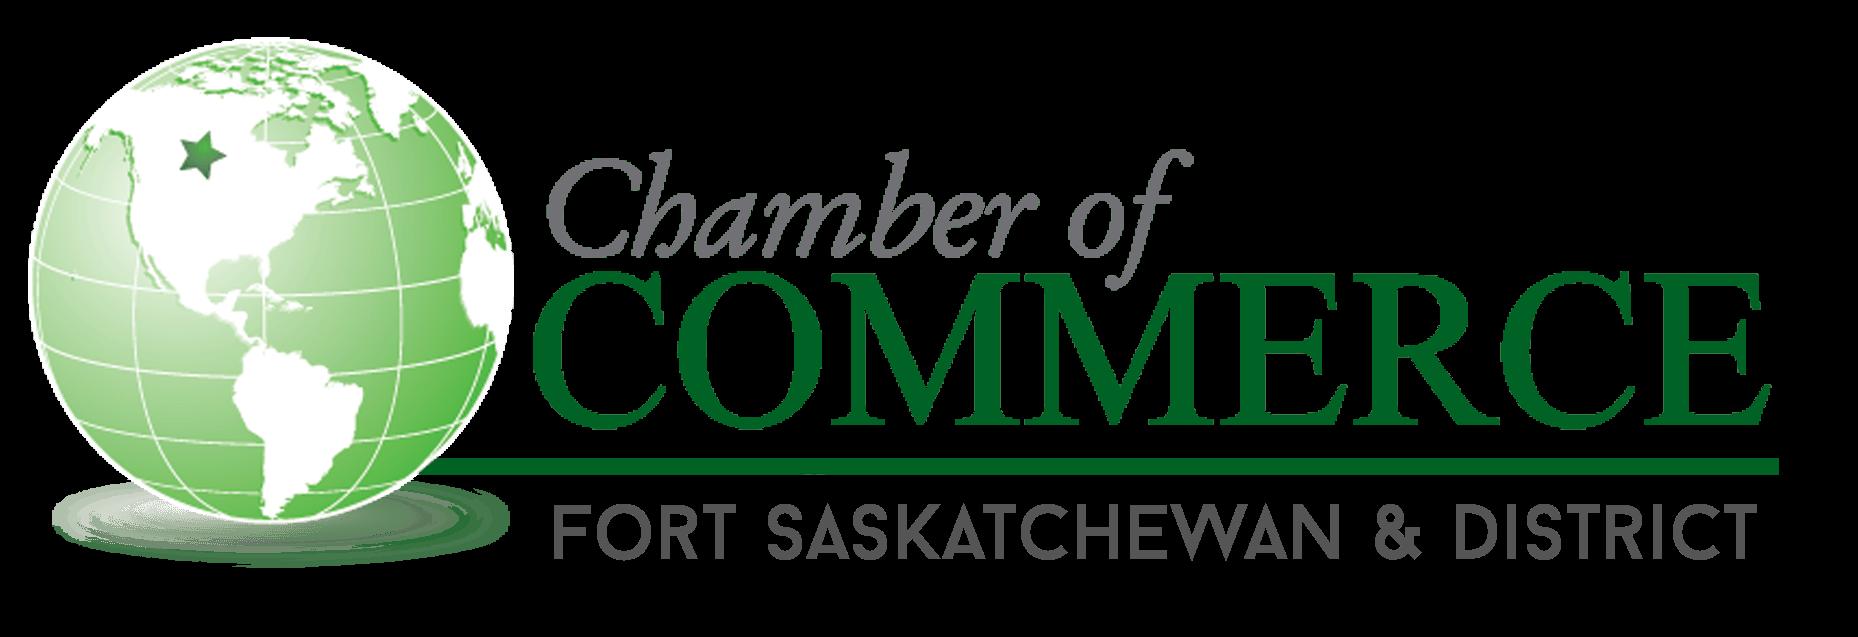 chamber of commerce fort Saskatchewan